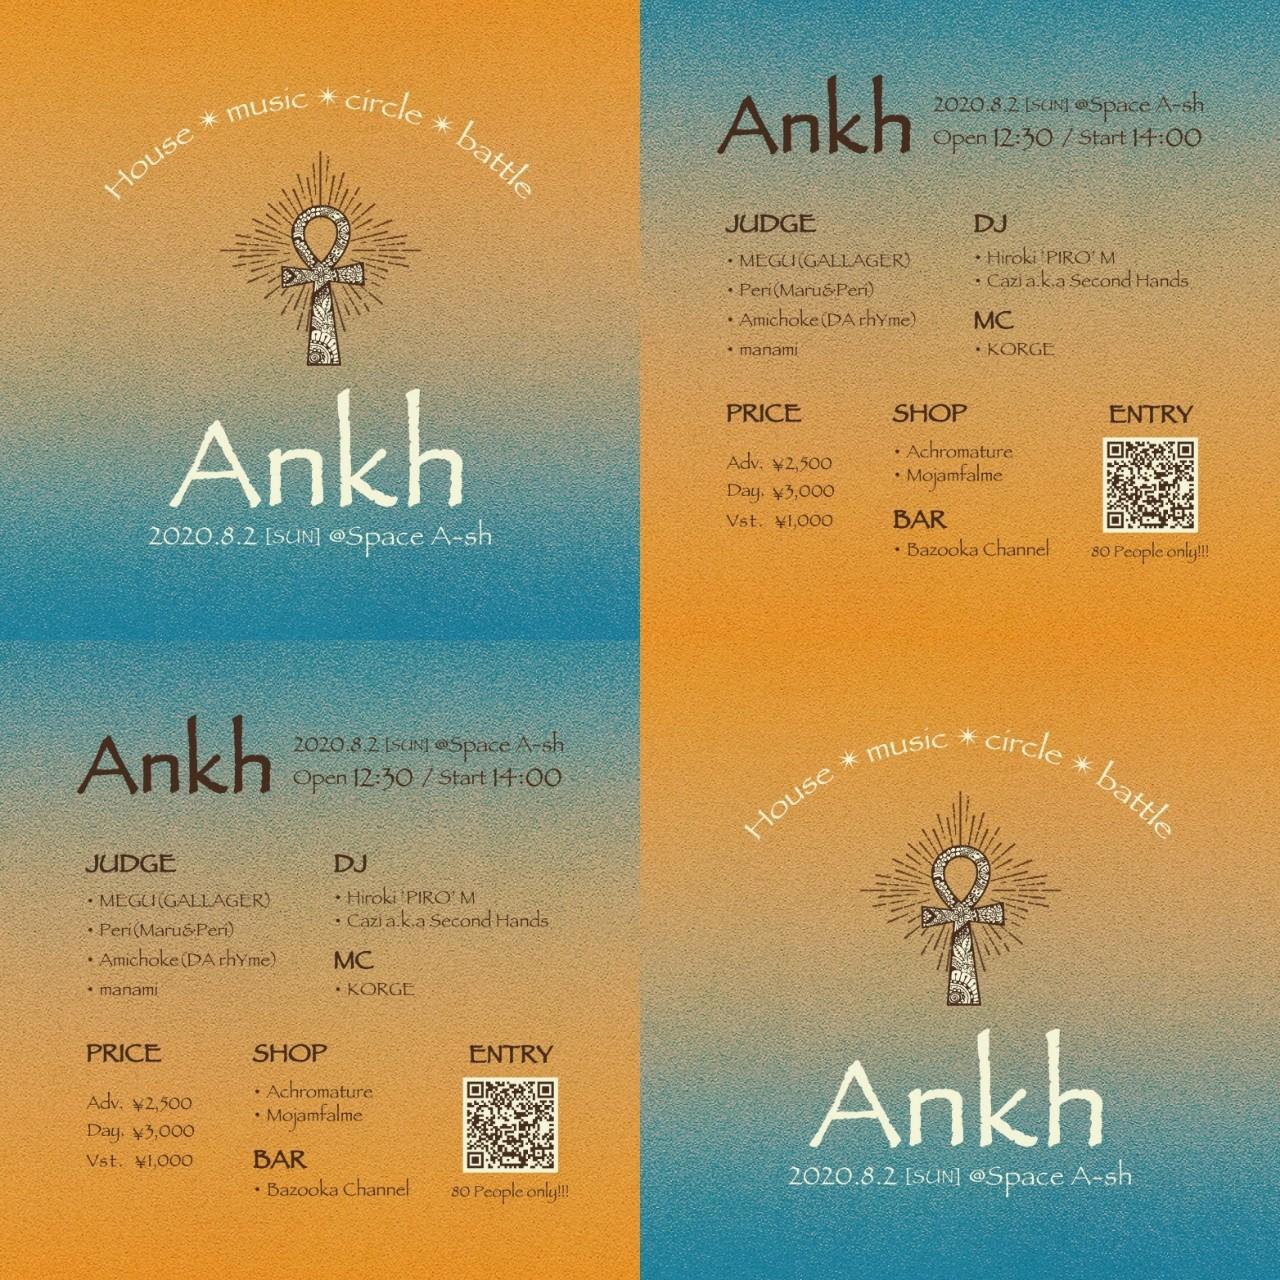 Ankh  House music circle battle